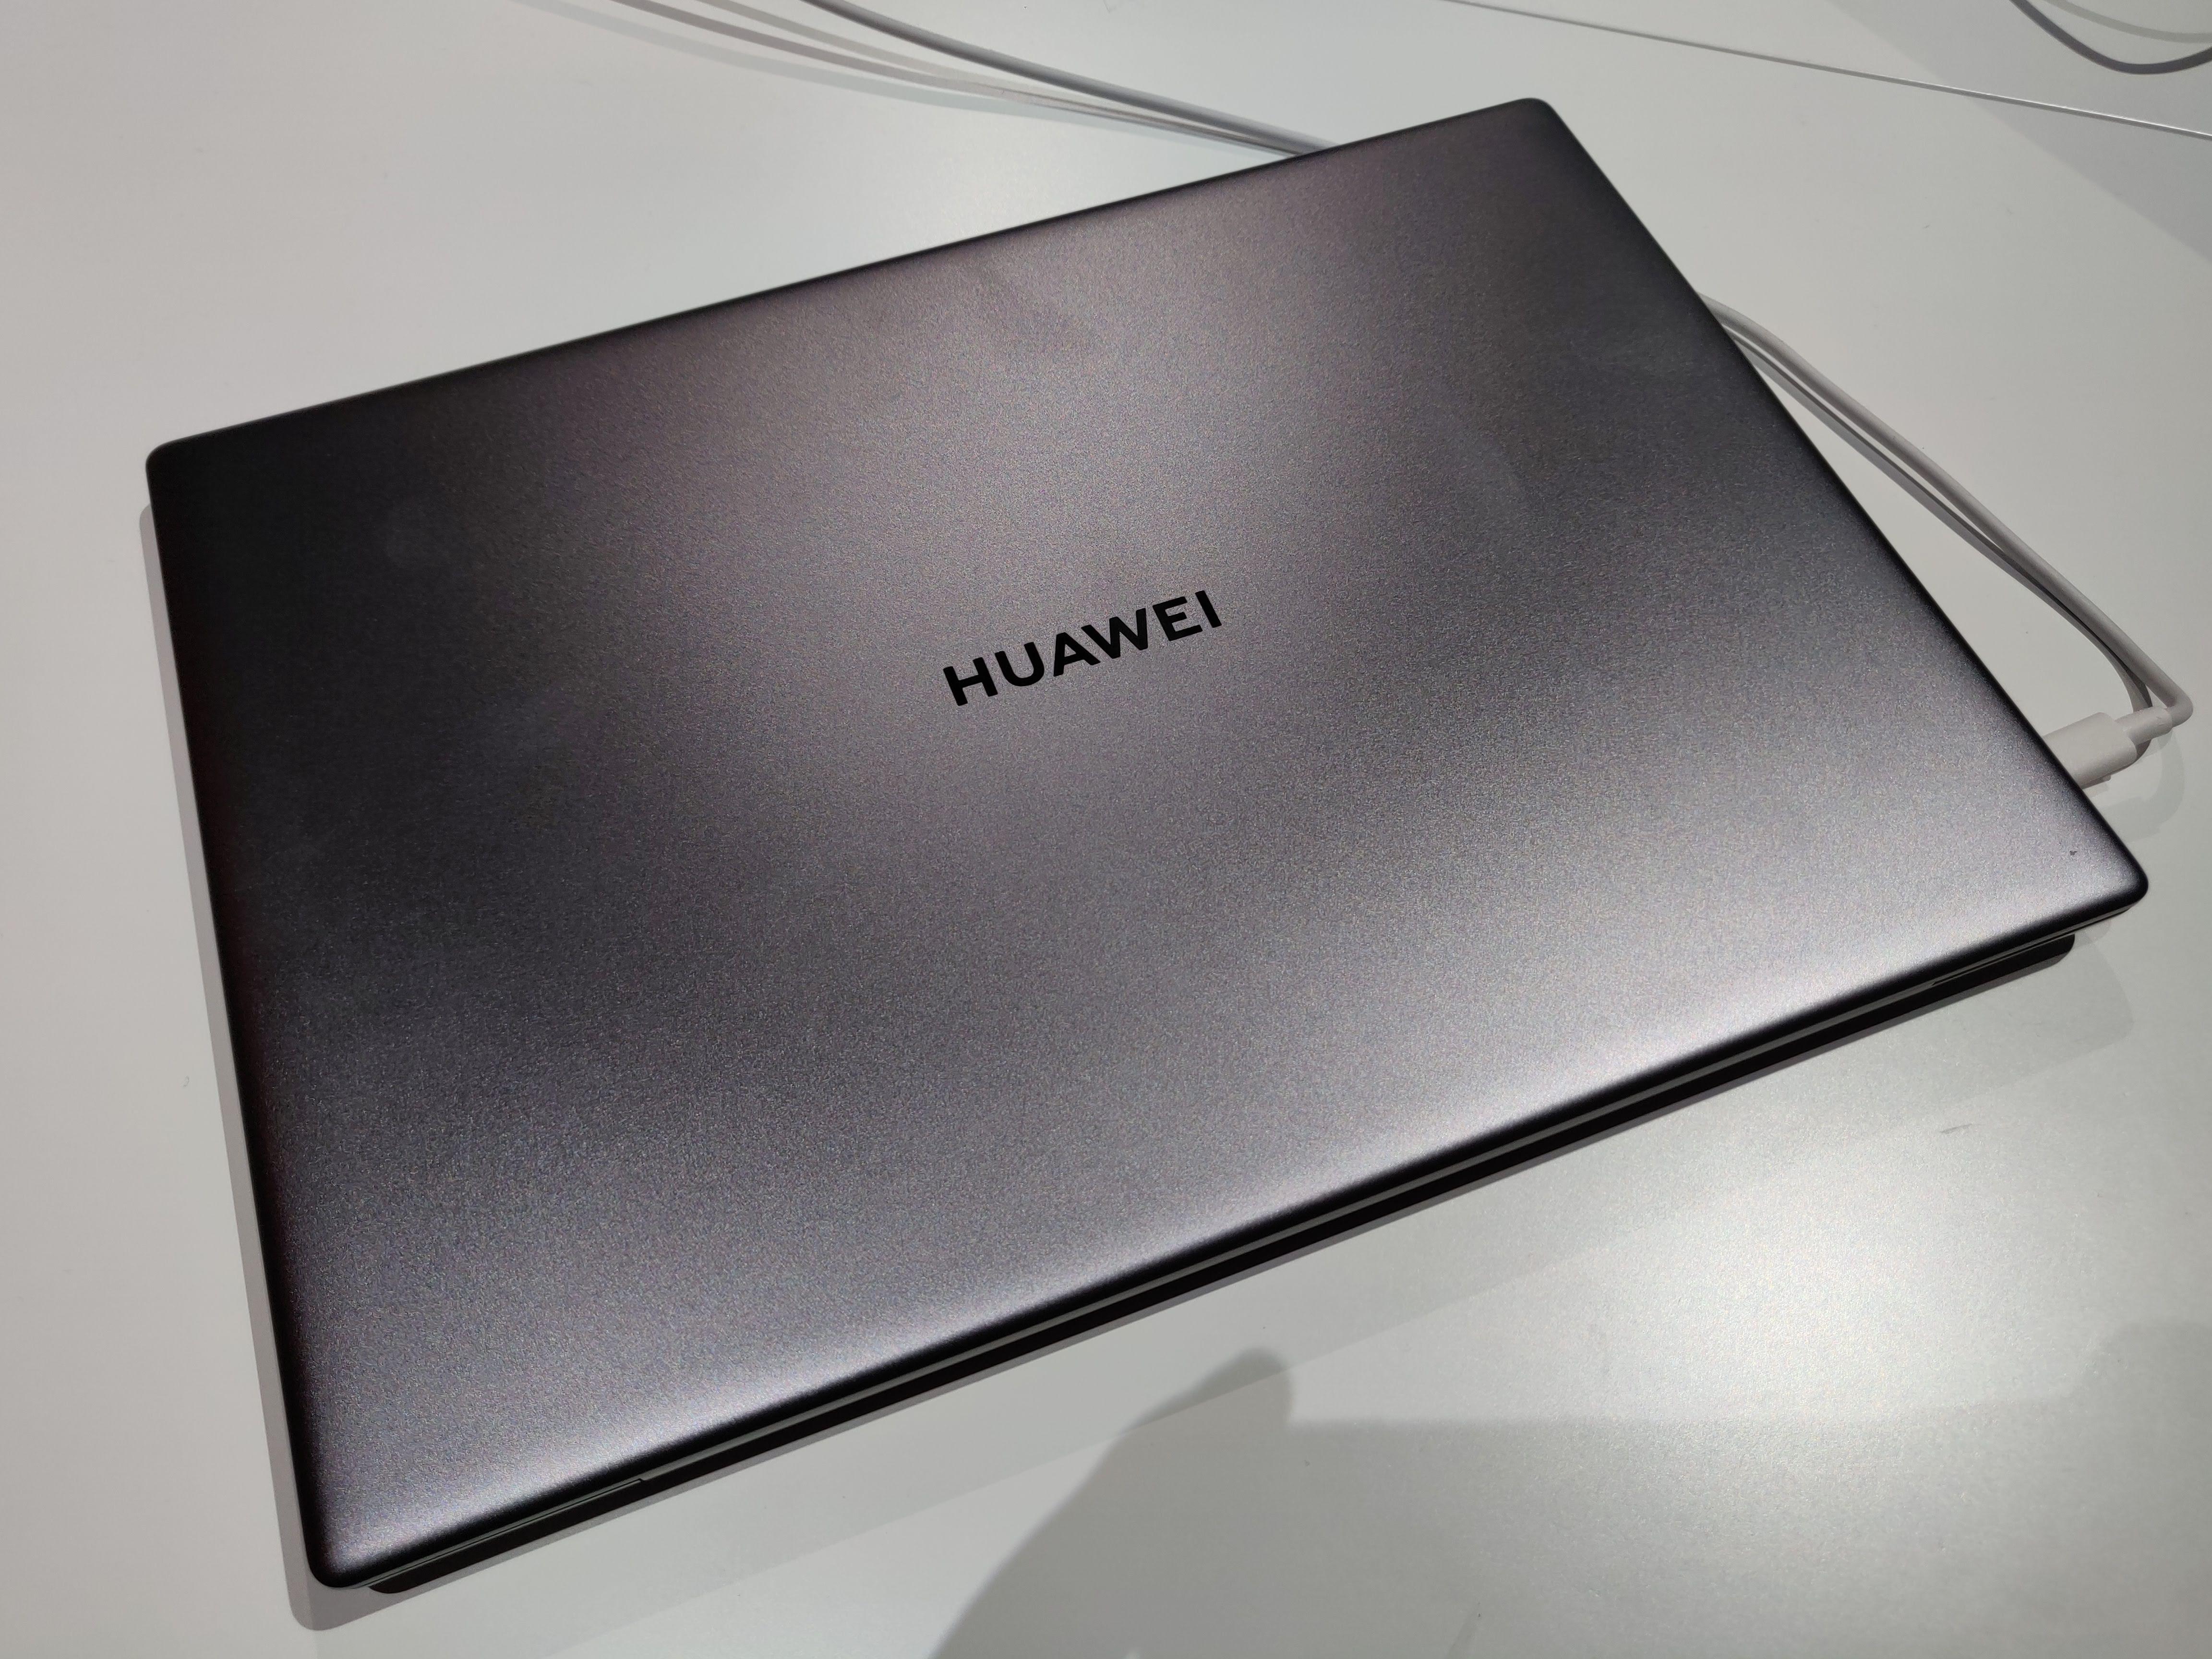 MWC 2019 : n'attendez pas d'ordinateur gaming chez Huawei